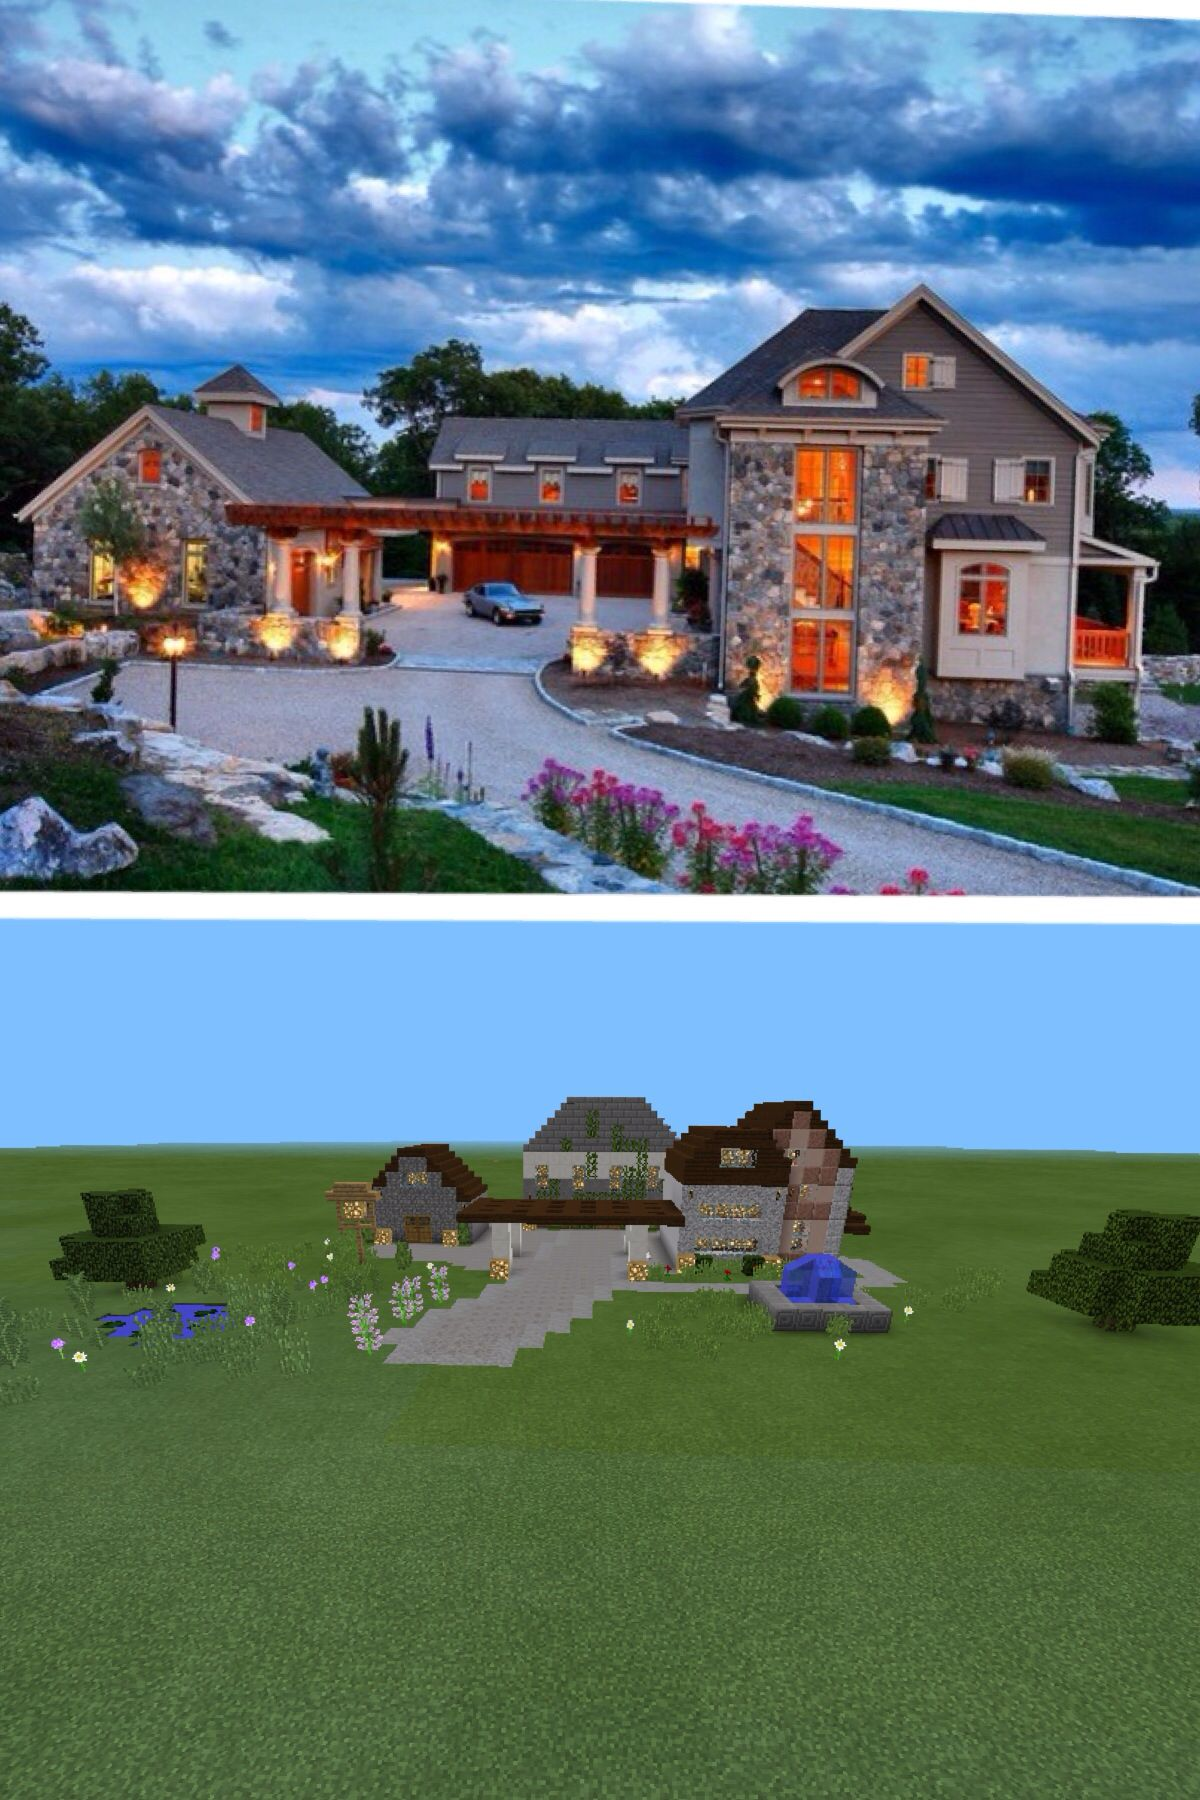 Minecraft build cool house | Minecraft | Pinterest | Craft